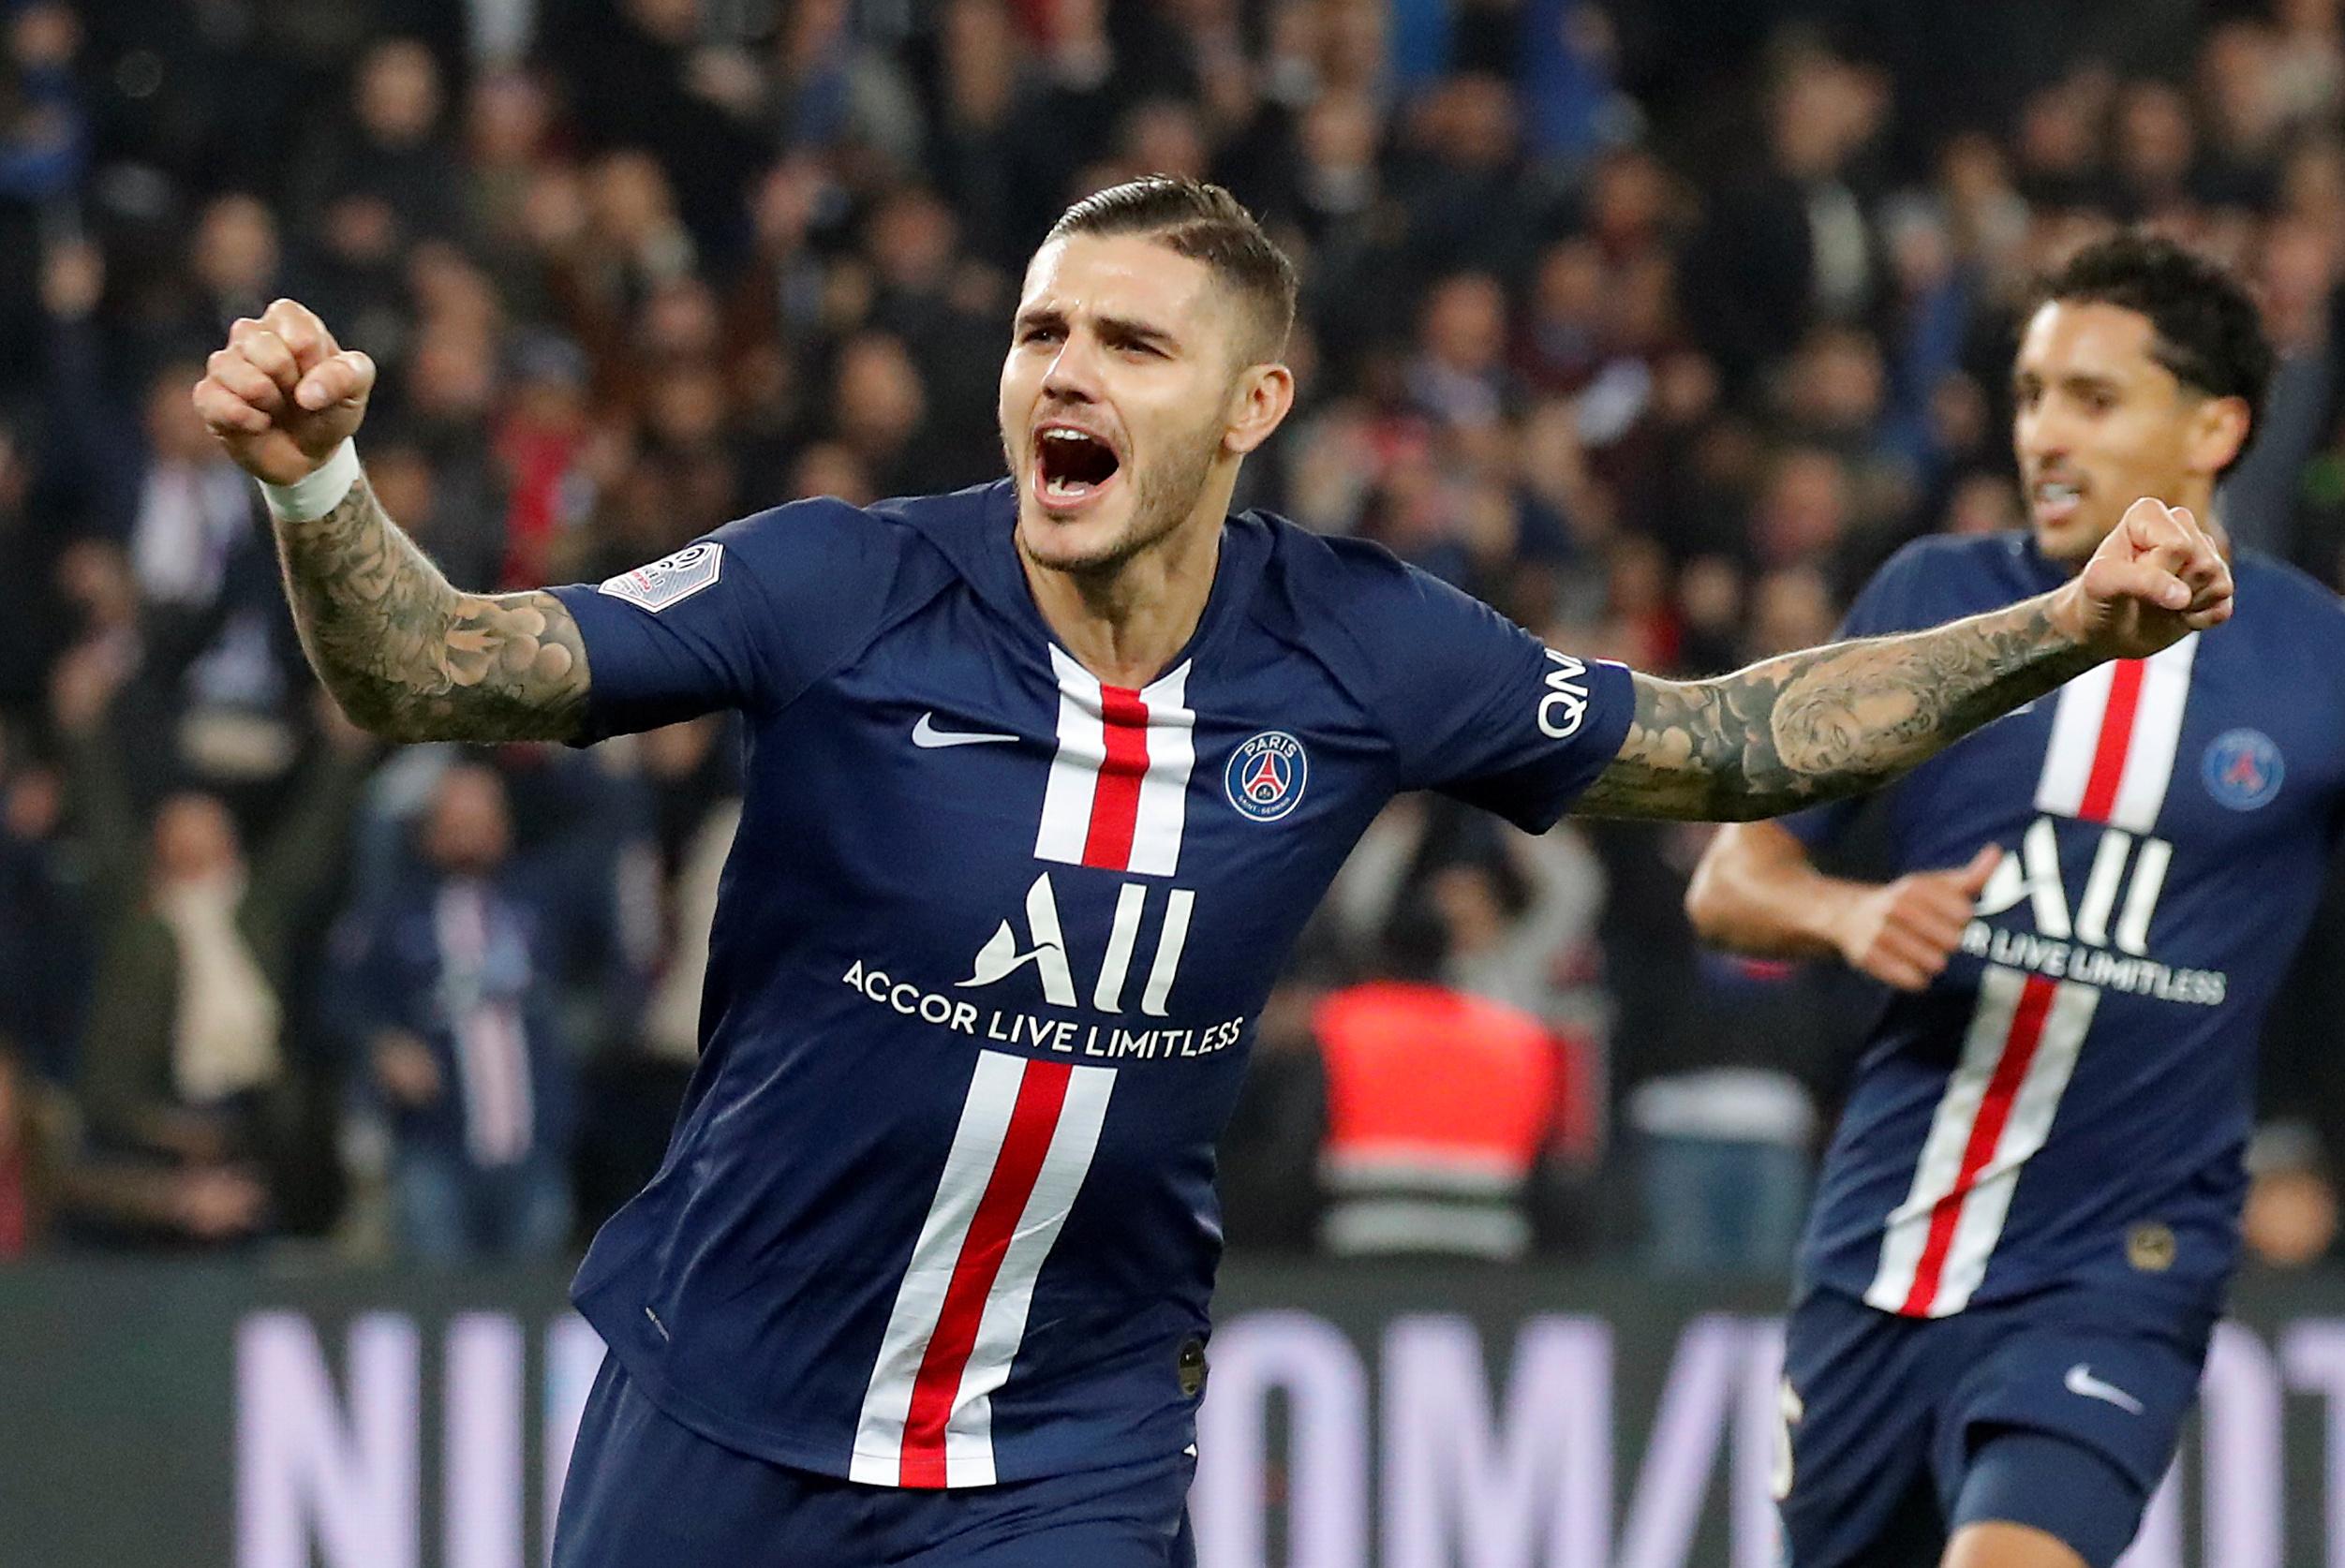 Paris Saint-Germain working on permanent deal for Inter Milan loanee Mauro Icardi